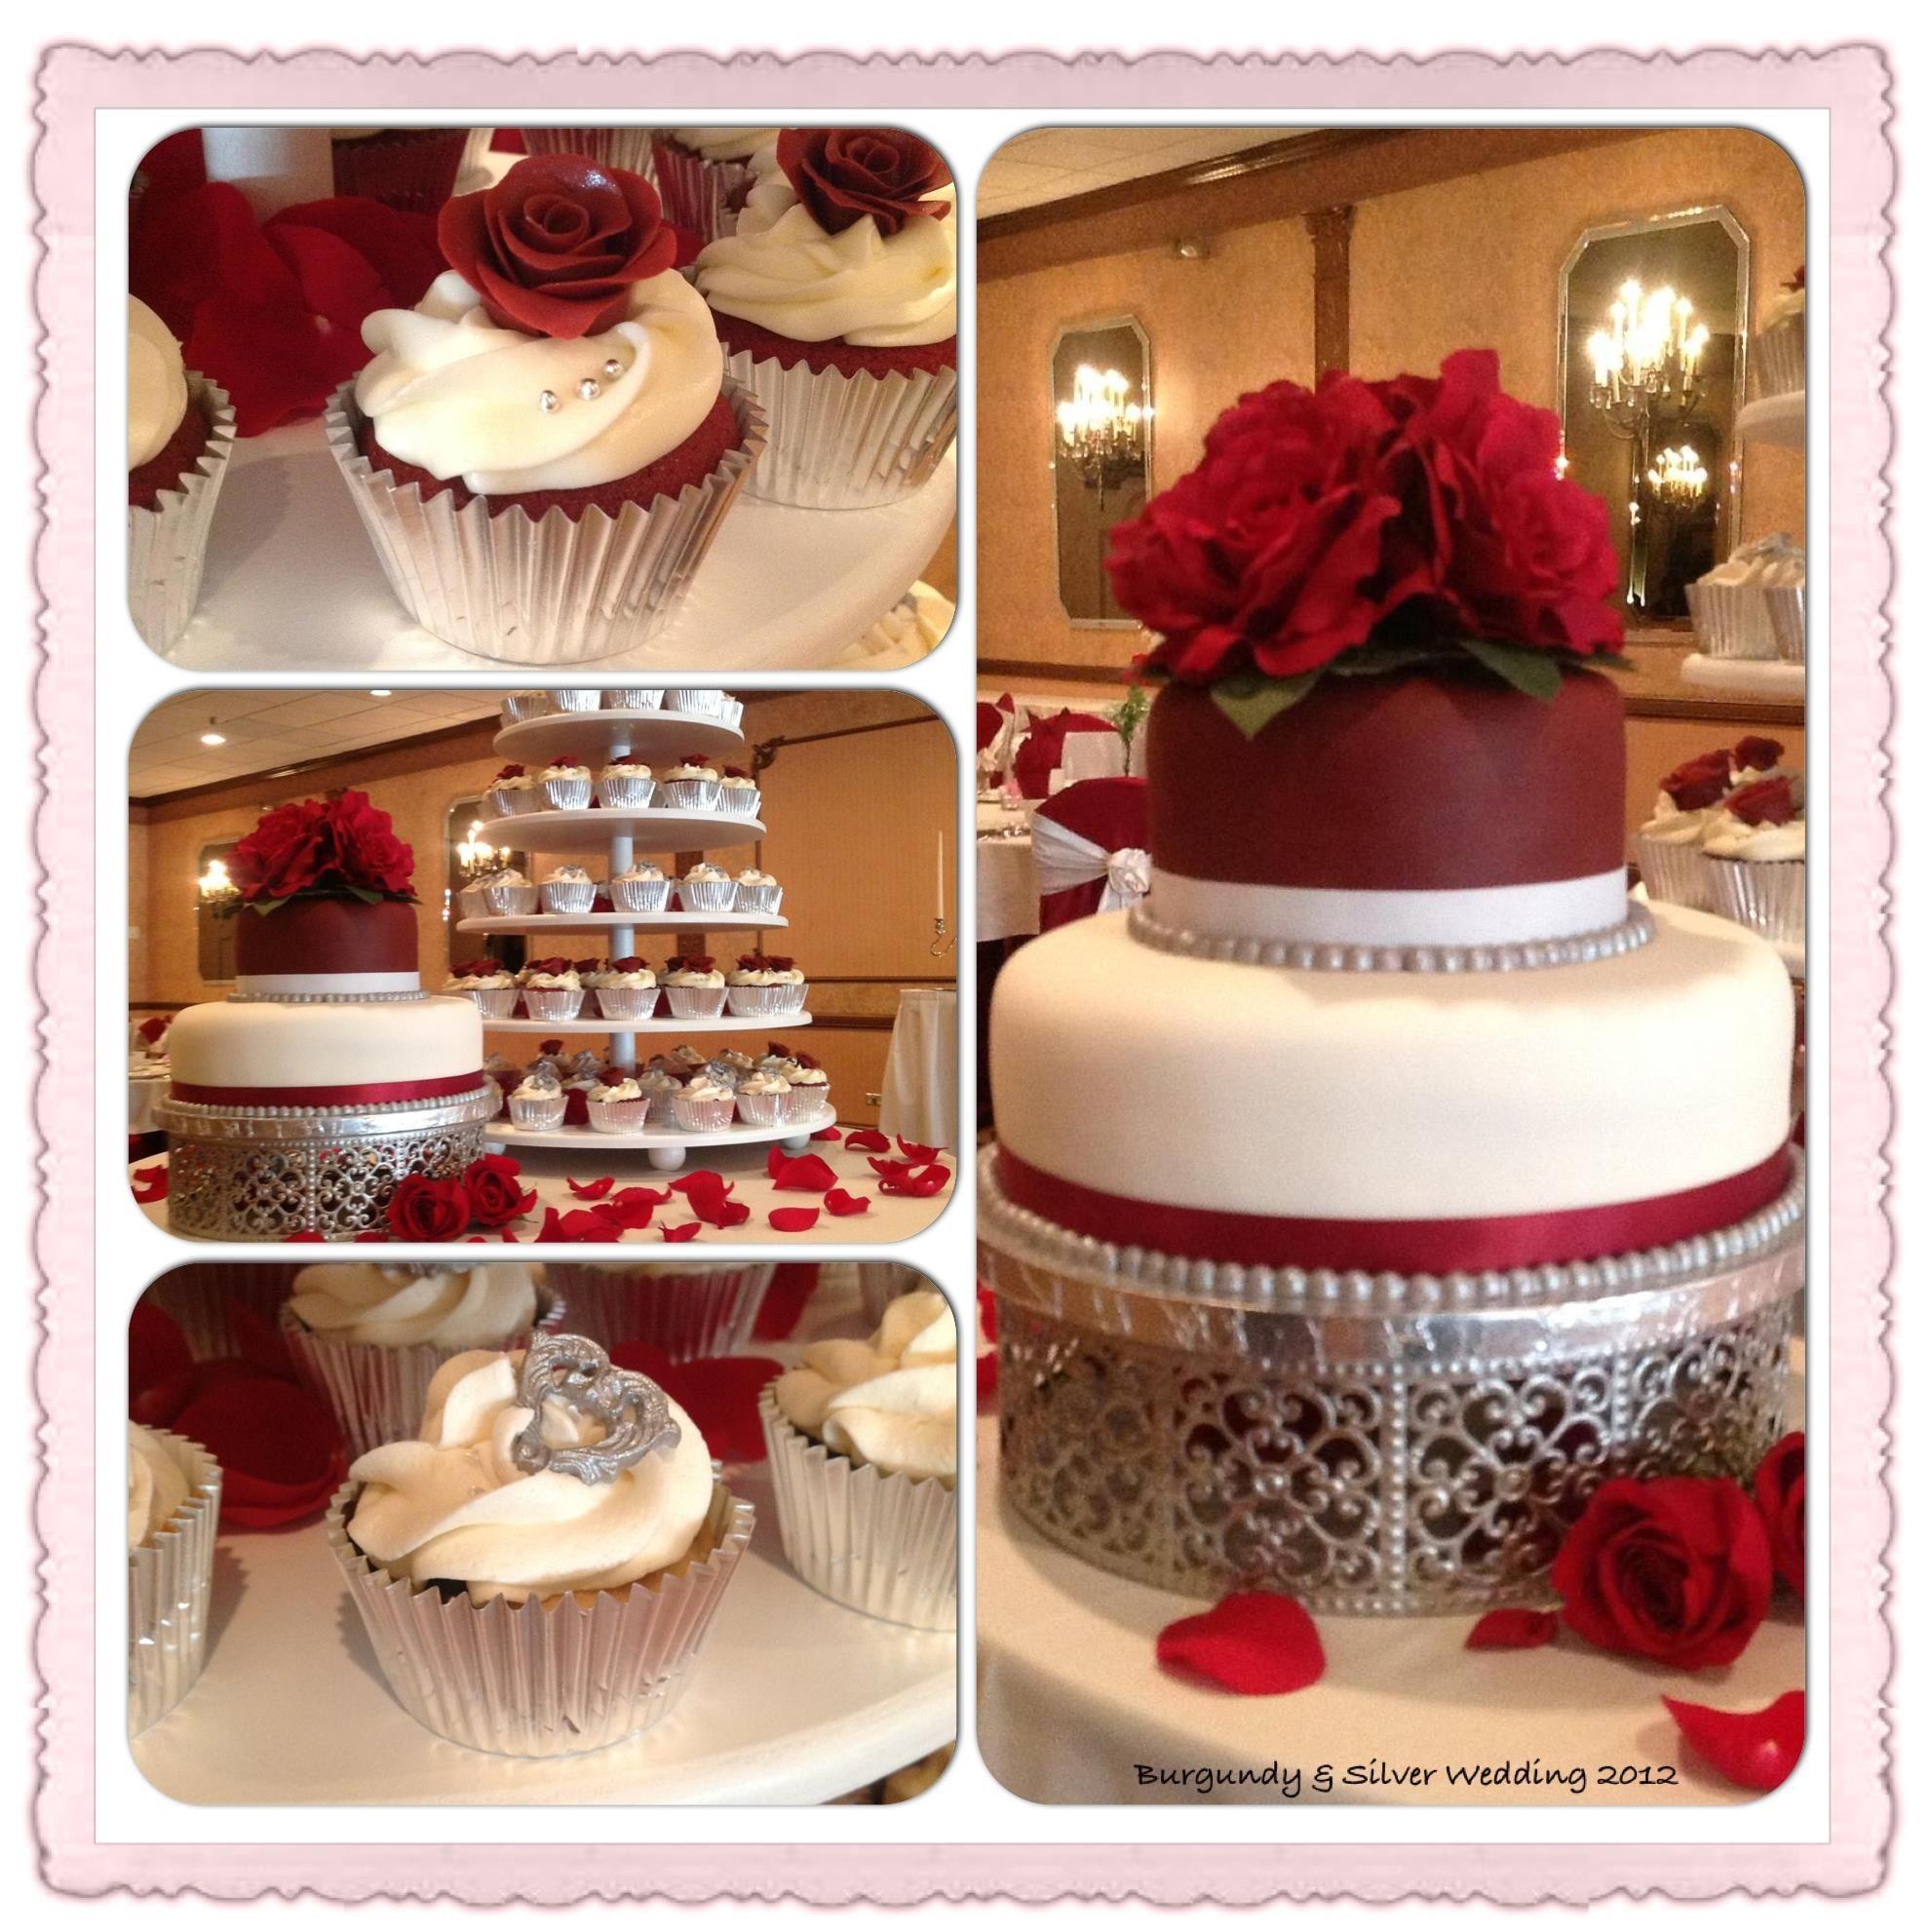 Pin By Cheryl Engberg On Cheryl S Sweet Arts Silver Wedding Cake Burgundy Wedding Cake Beautiful Wedding Cakes